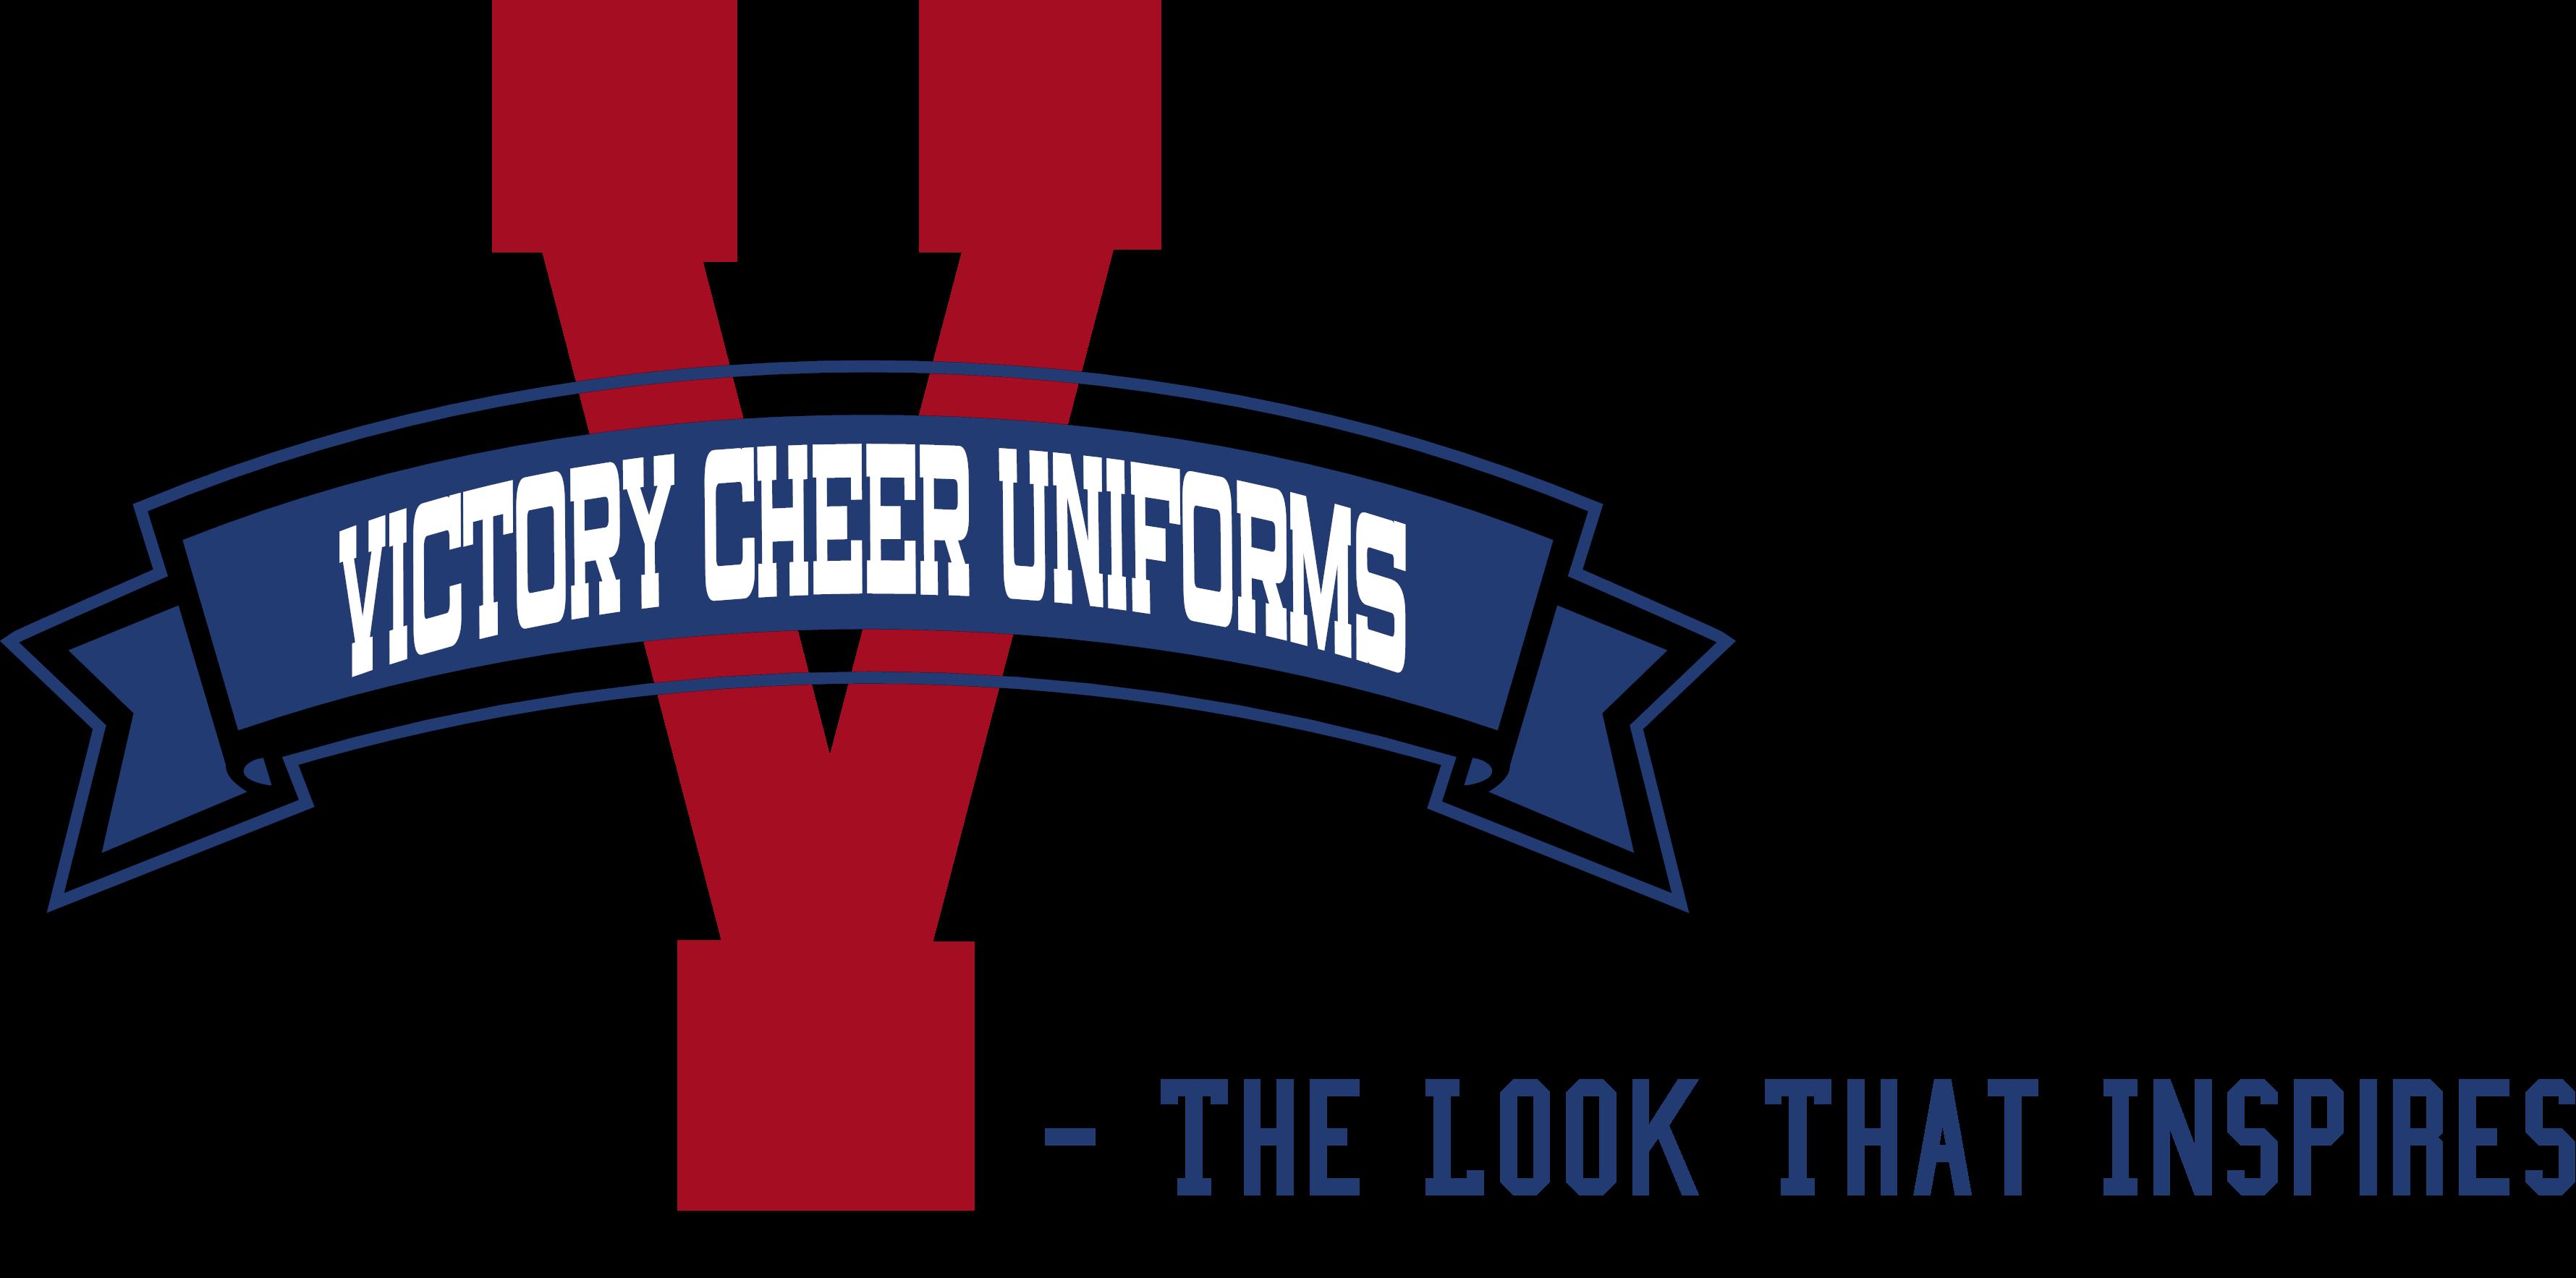 Shell clipart bra. Cheerleading uniforms